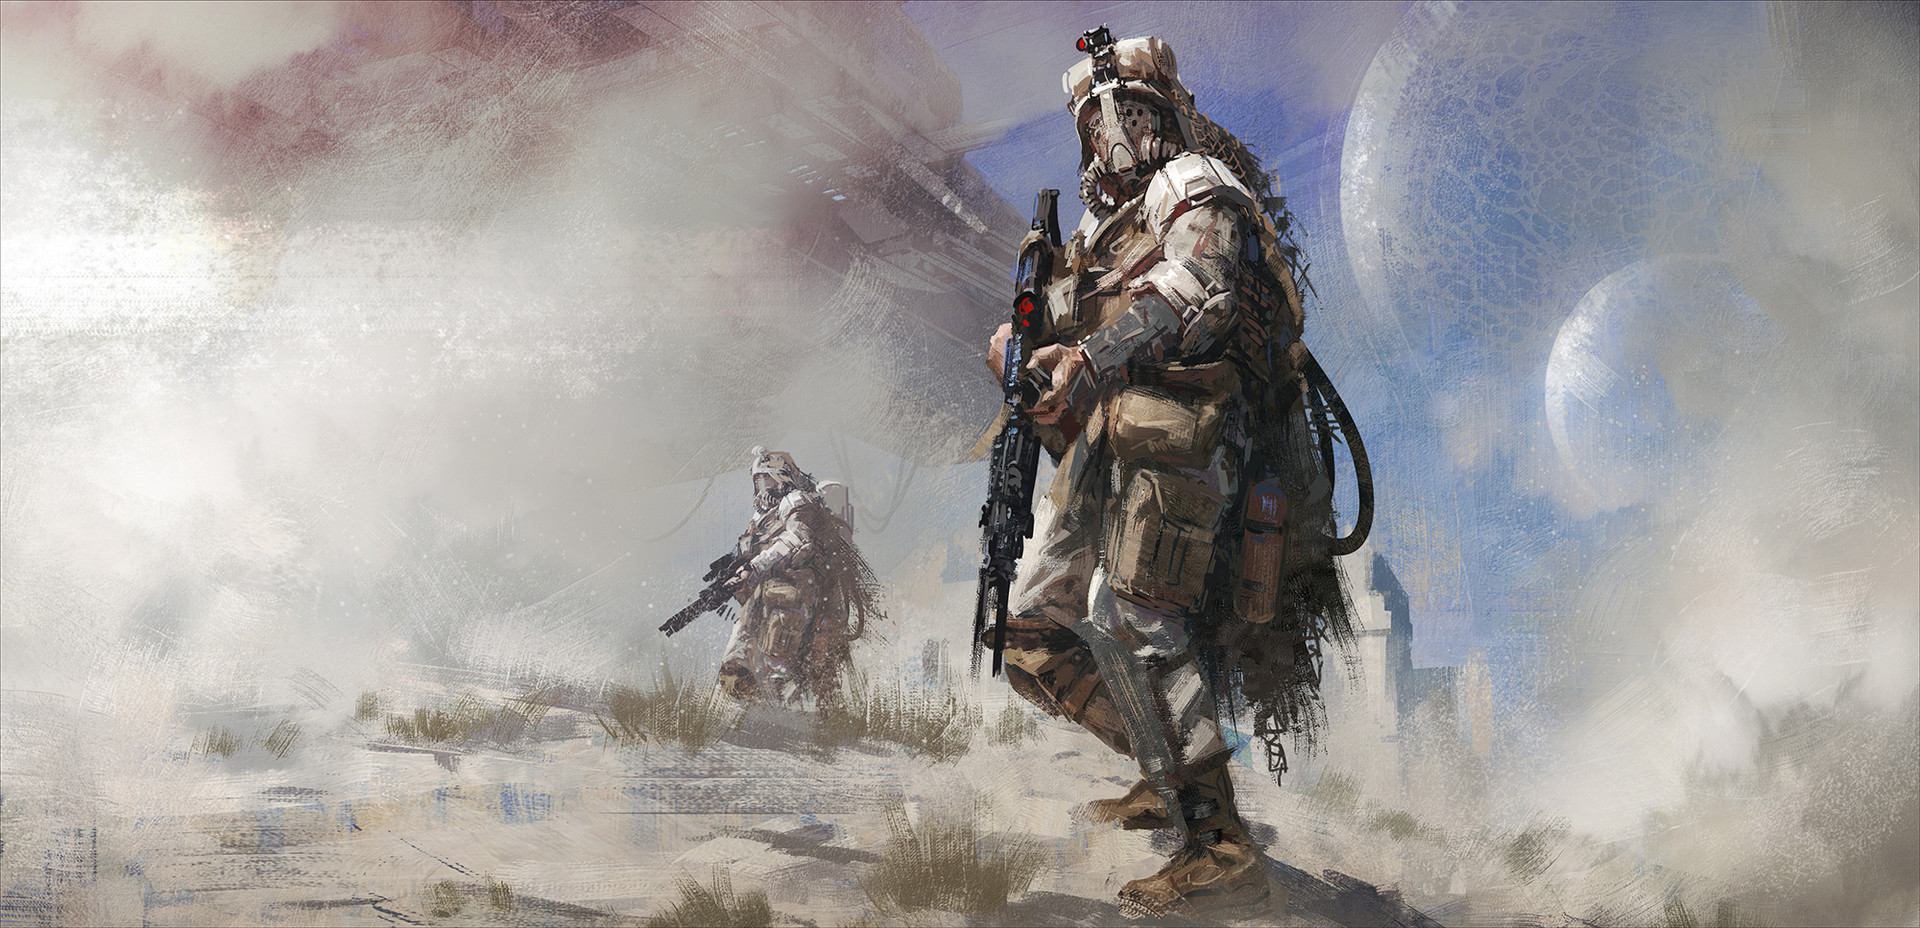 concept art painting desert apocalyptic camouflage joakim ericsson gas masks soldier artwork science fiction rifles digital art futuristic illustration